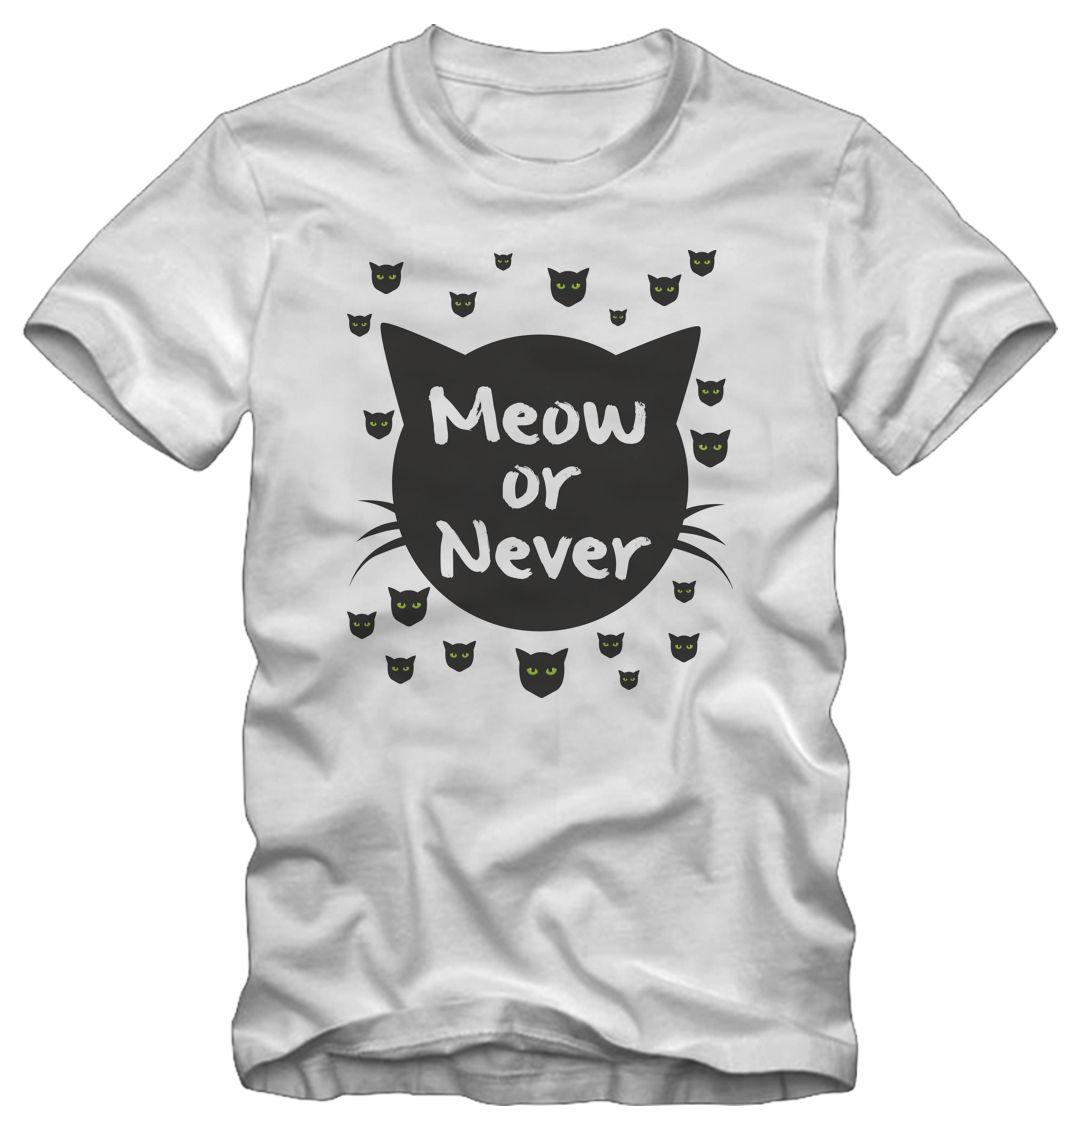 T-shirt /Maglietta Meow or Never Kraz Shop Customize Tee Shirts